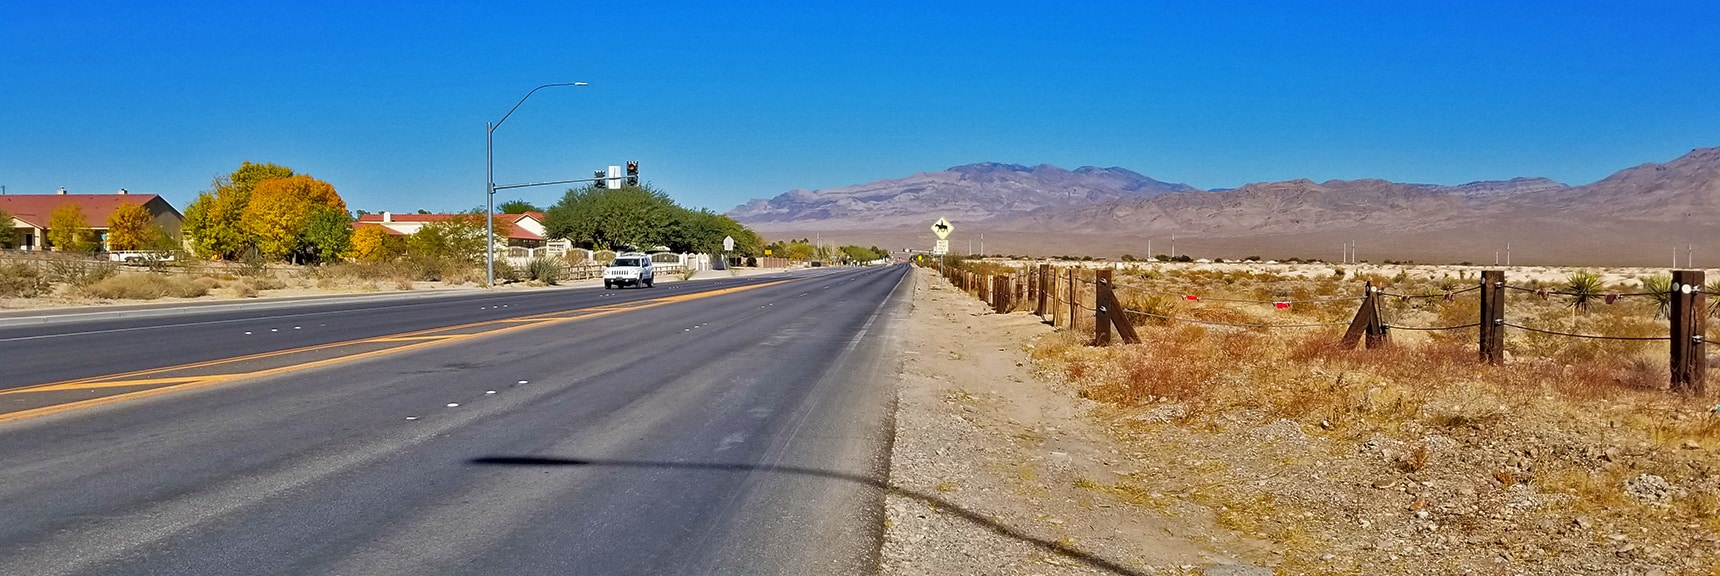 Heading North on Durango Toward Its Northern End   Centennial Hills Mountain Bike Conditioning Adventure Loop, Las Vegas, Nevada